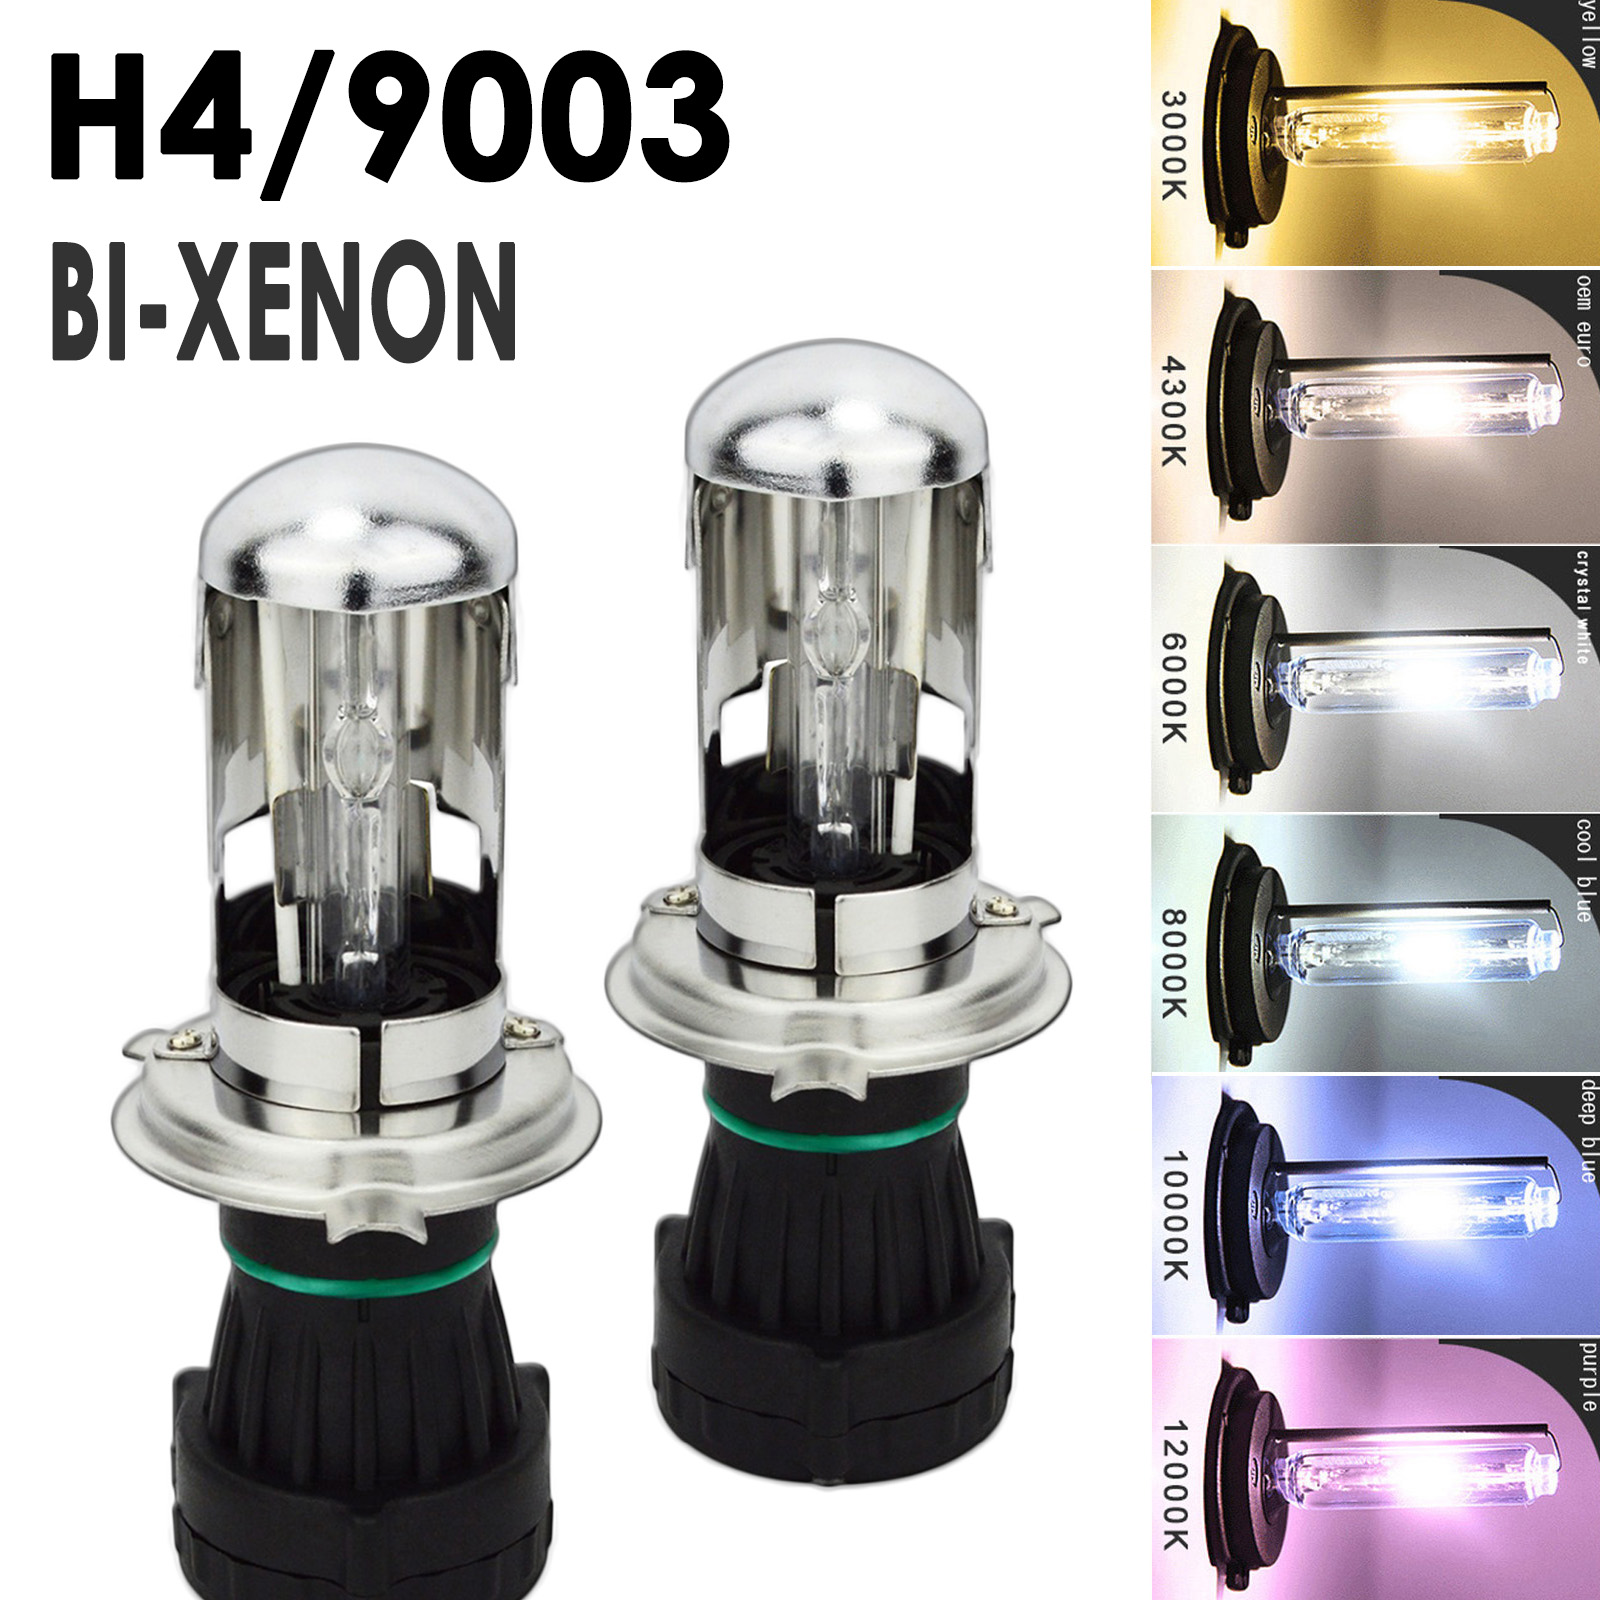 - 2 Year Warranty 1 Pair HID-Warehouse HID Xenon Replacement Bulbs H4 // 9003 30000K Deep Blue